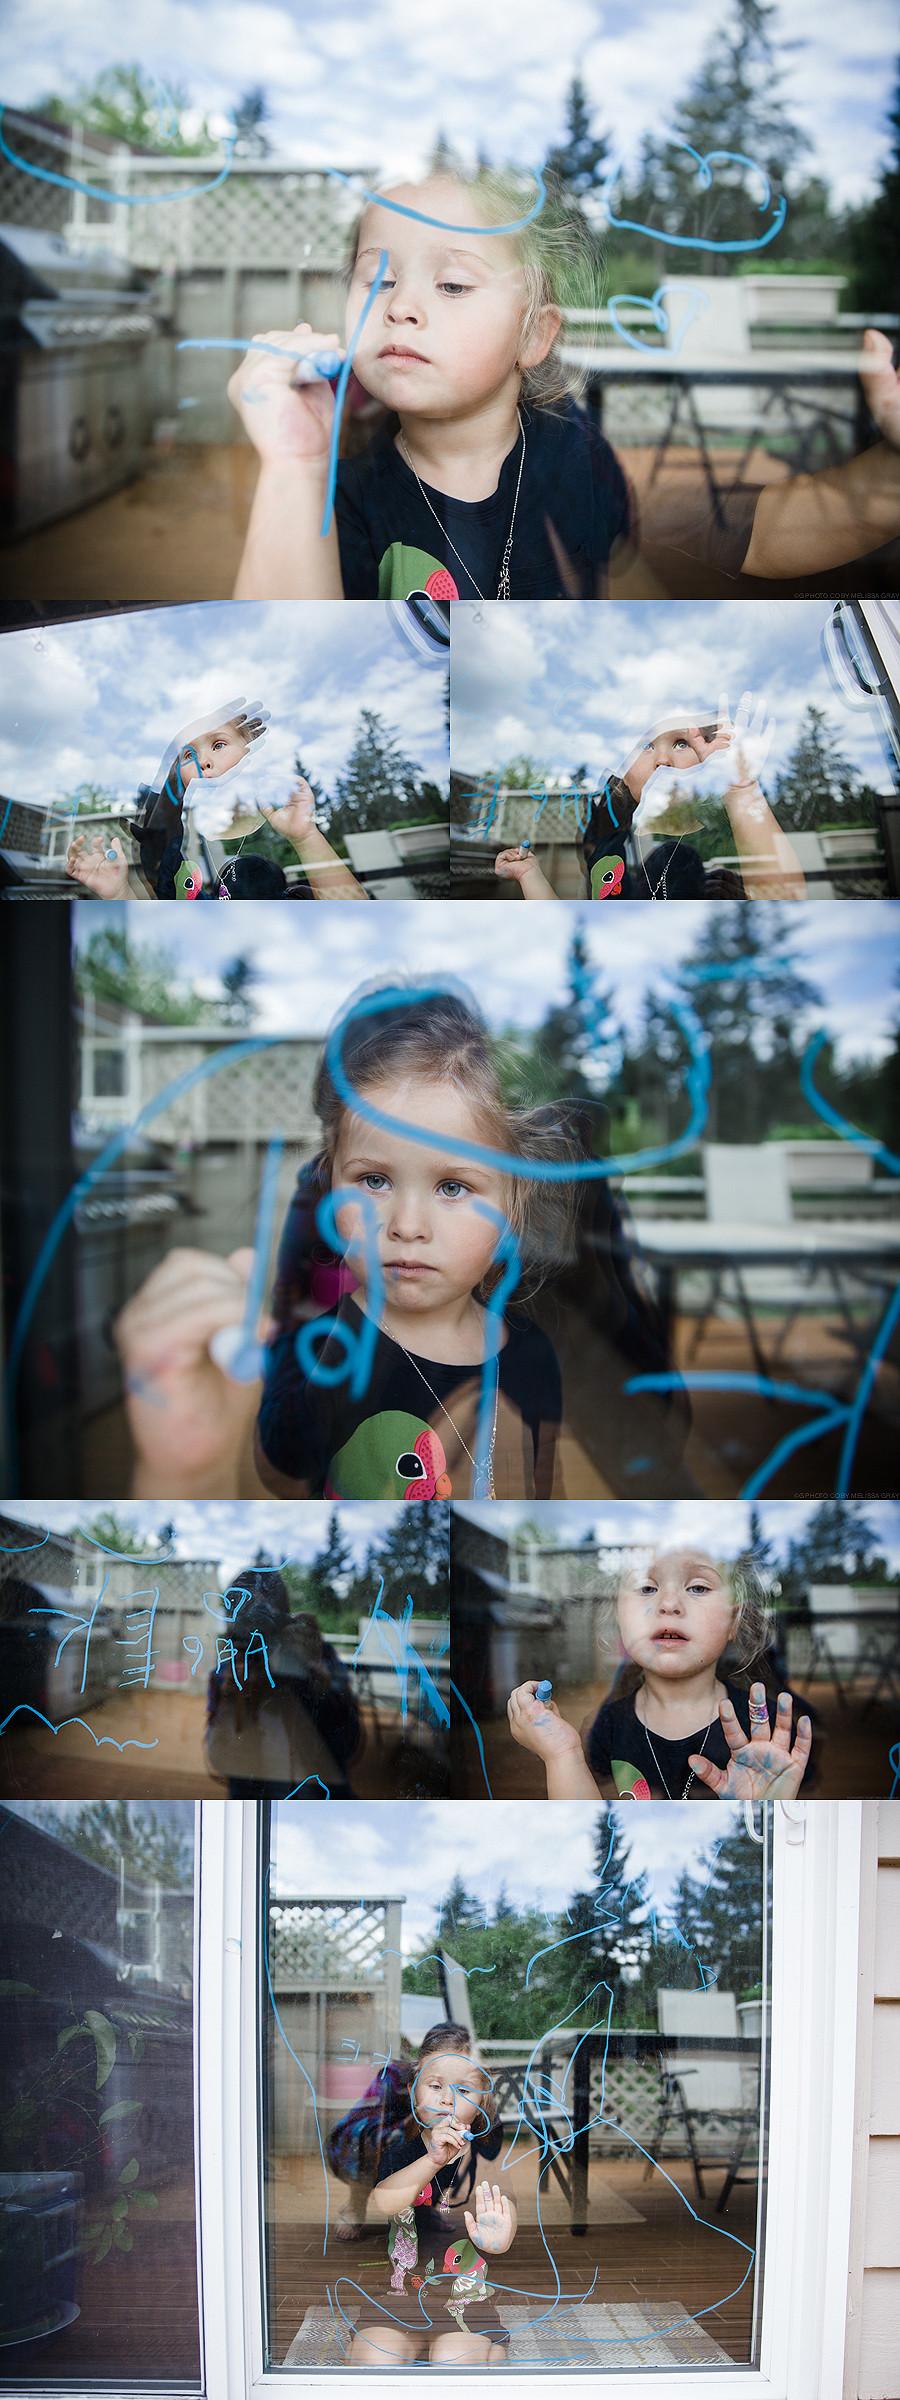 gphotoco_windowcrayon.jpg